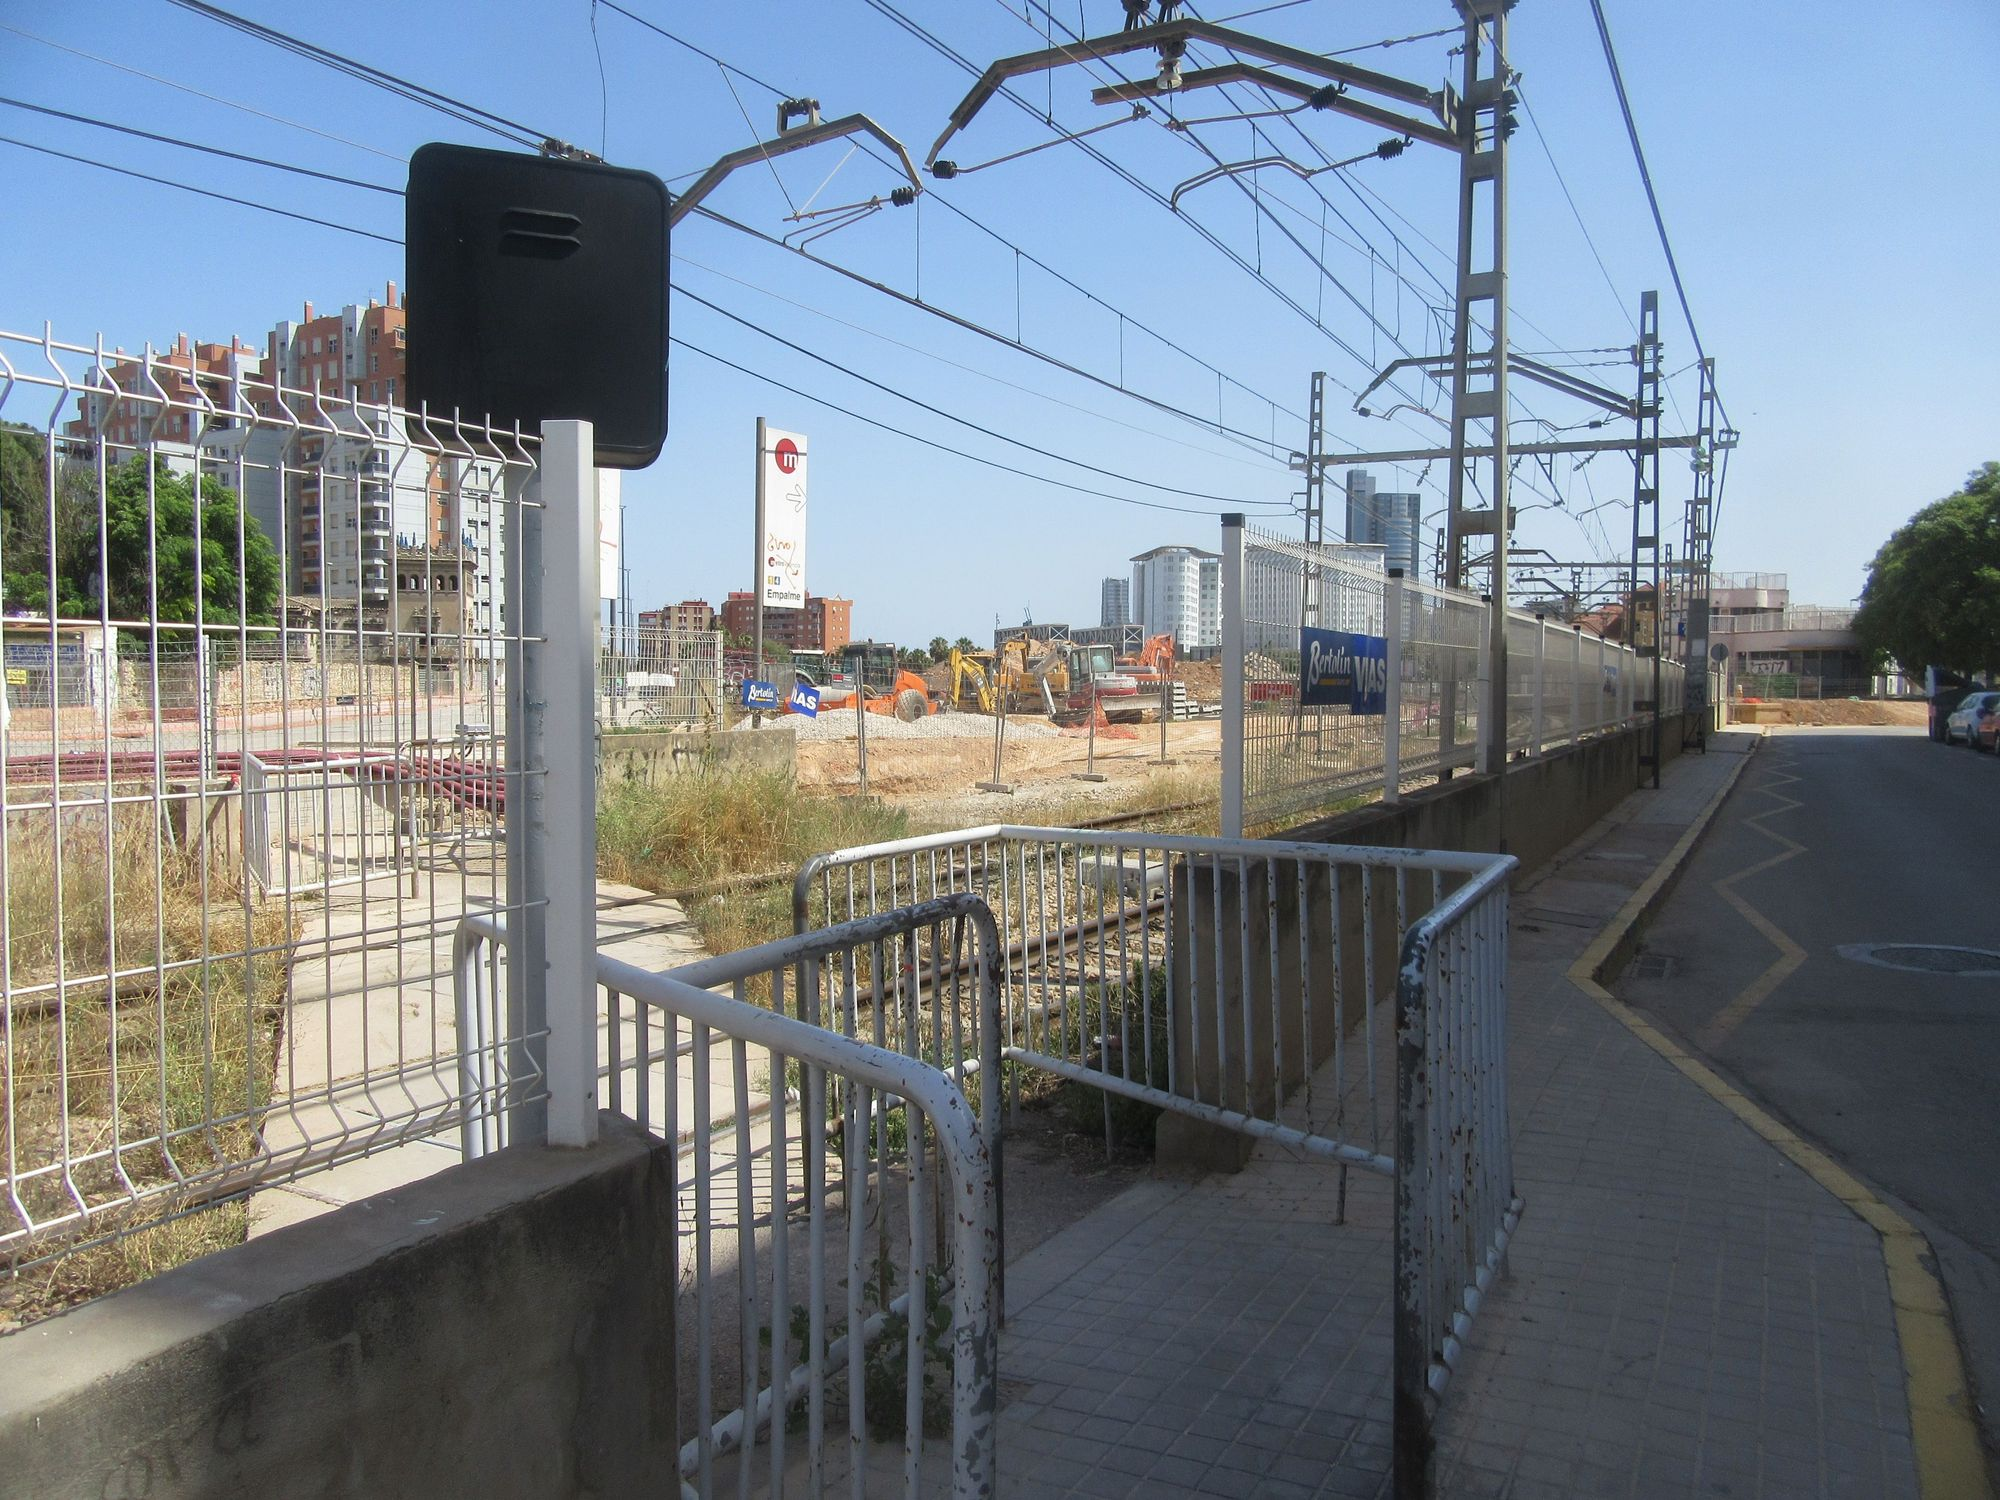 Inminente corte del metro en Burjassot